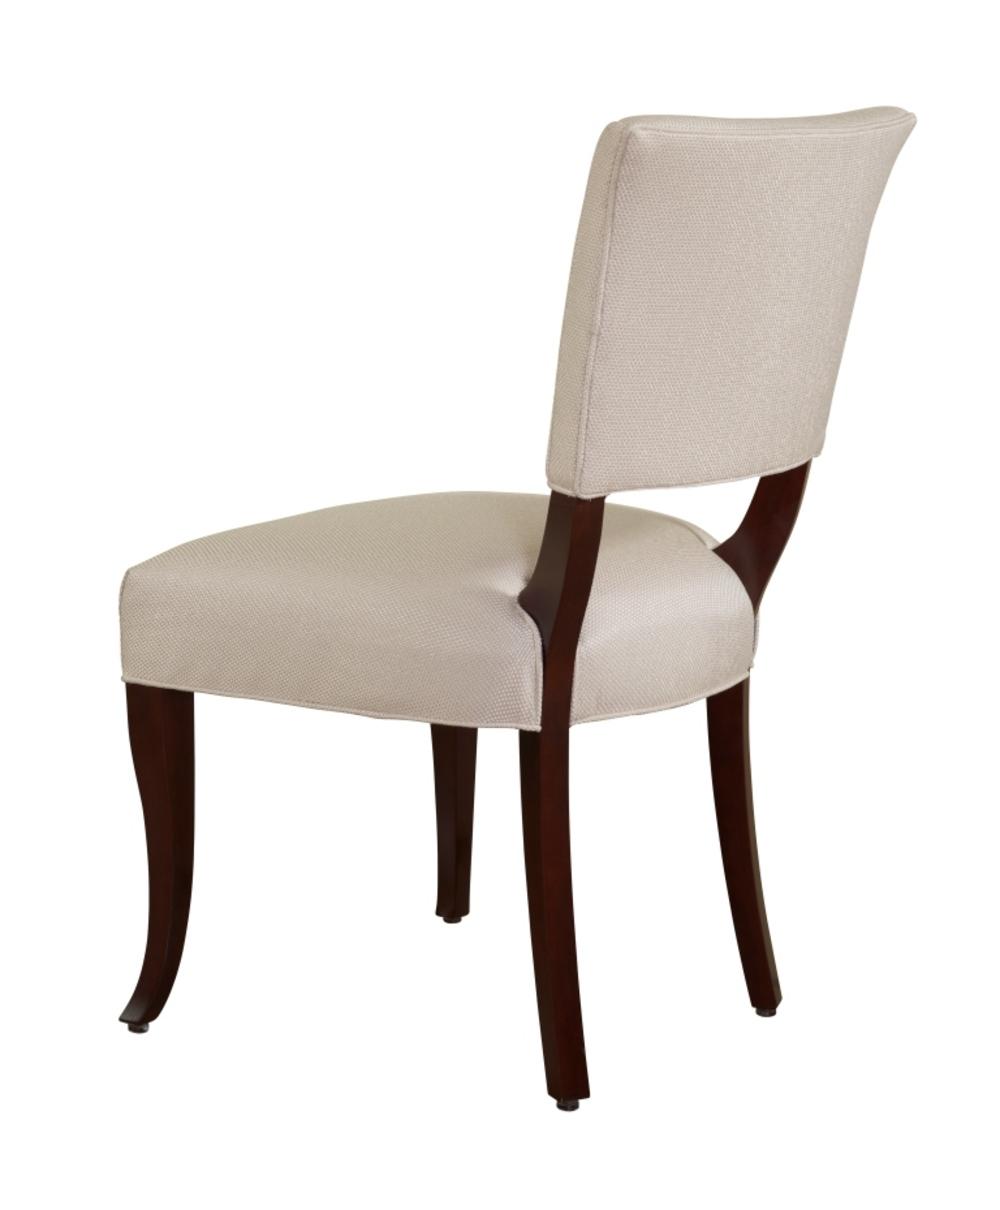 Designmaster Furniture - Donora Side Chair